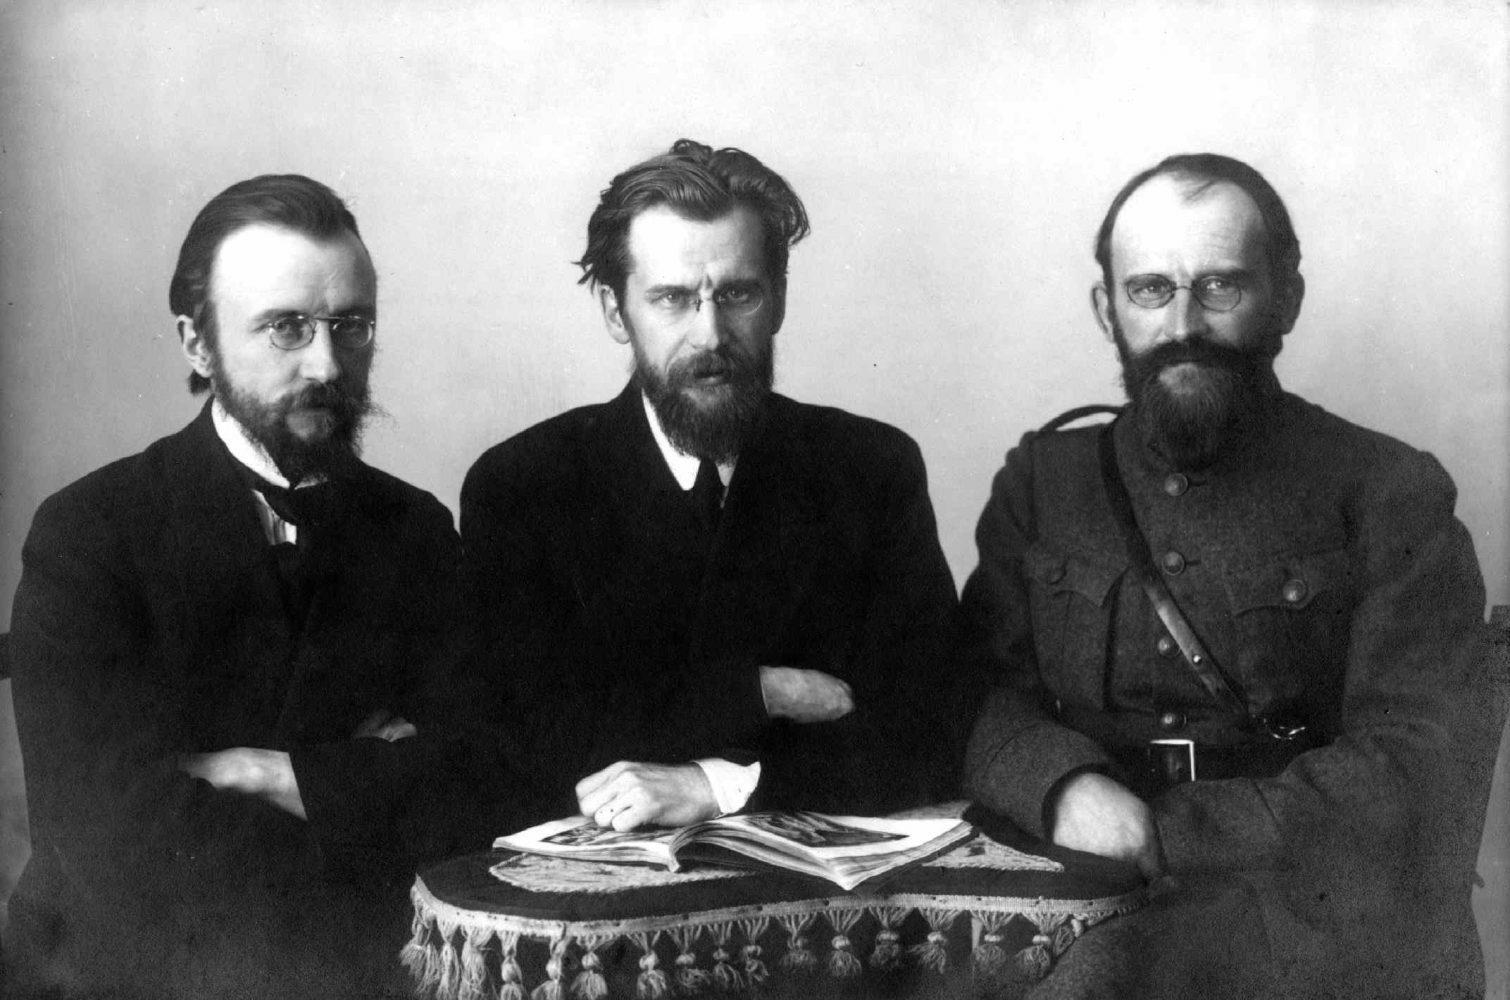 Viktoras, Mykolas ir Vaclovas Biržiškos